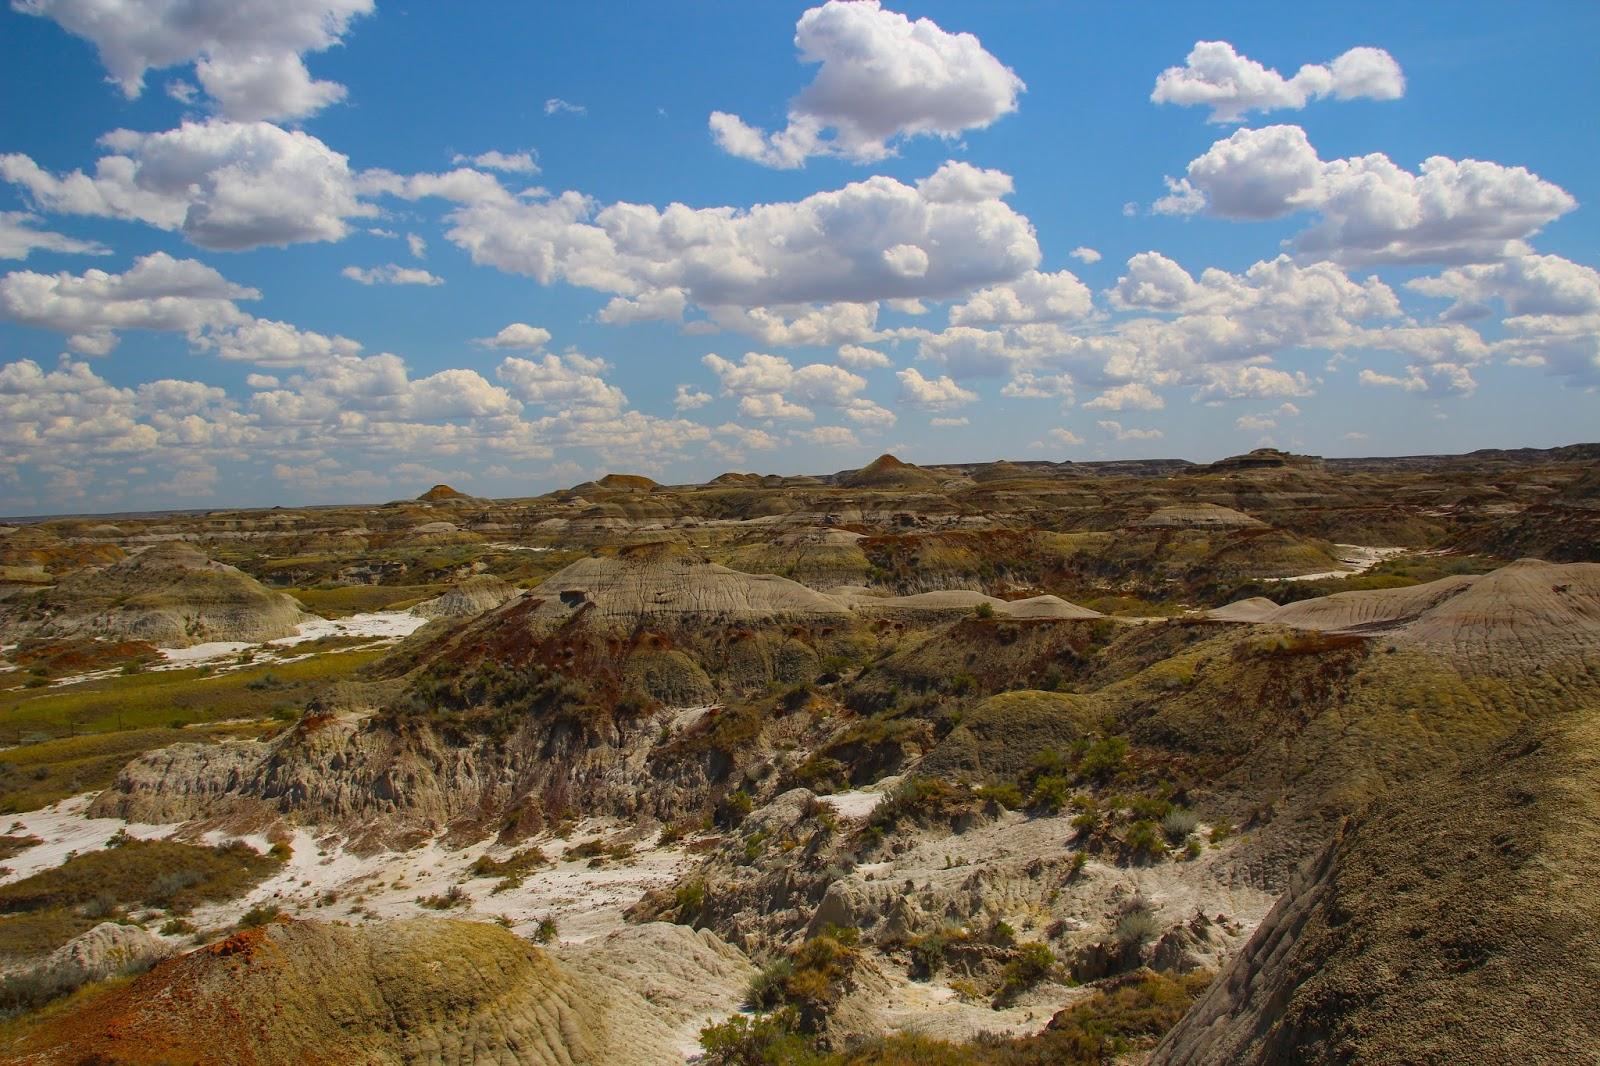 003 - Dinosaur PP Landscape